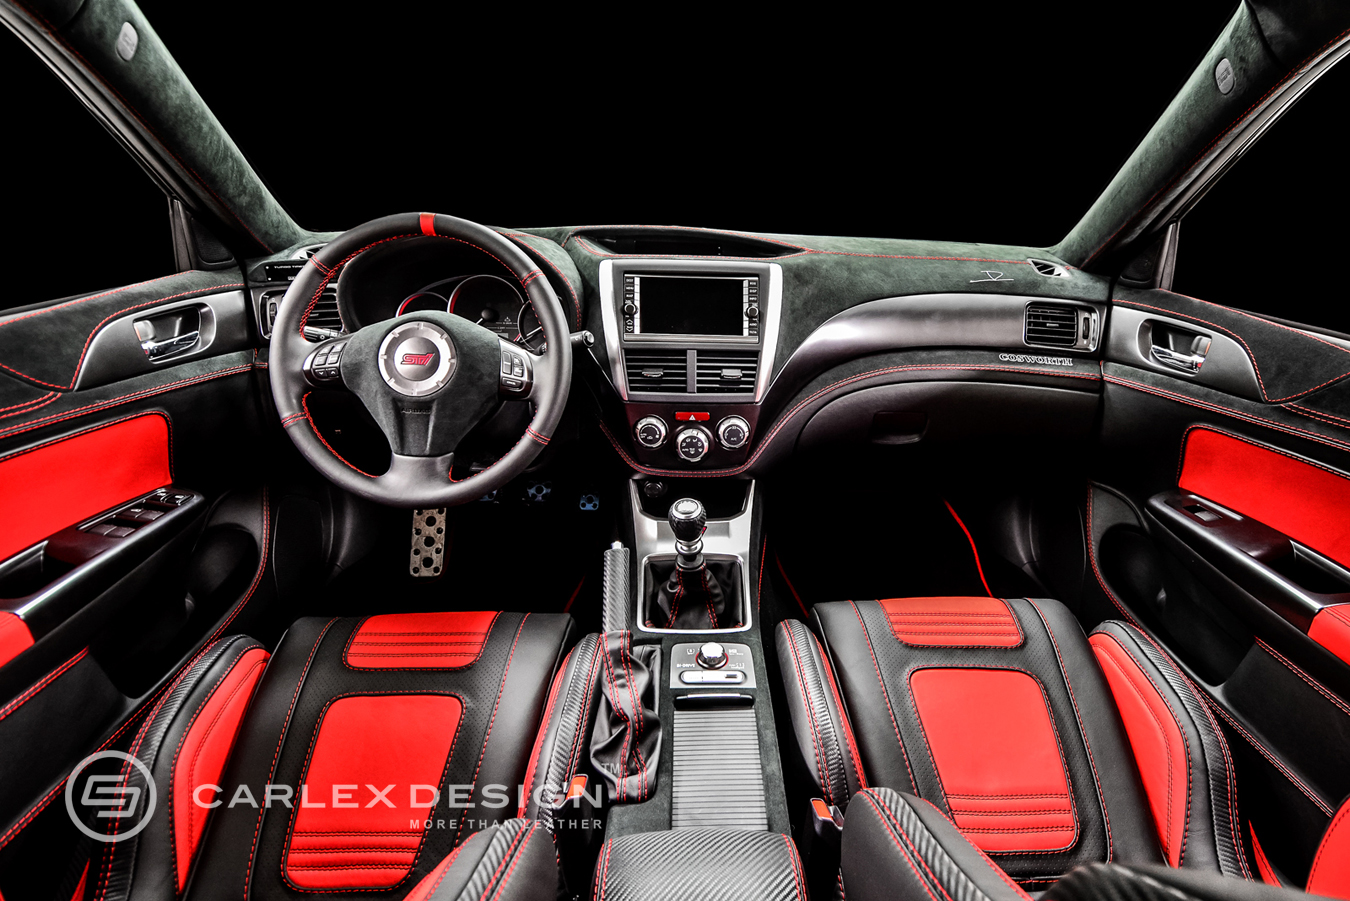 The Wild Beast Subaru Impreza Wrx Sti Von Carlex Design